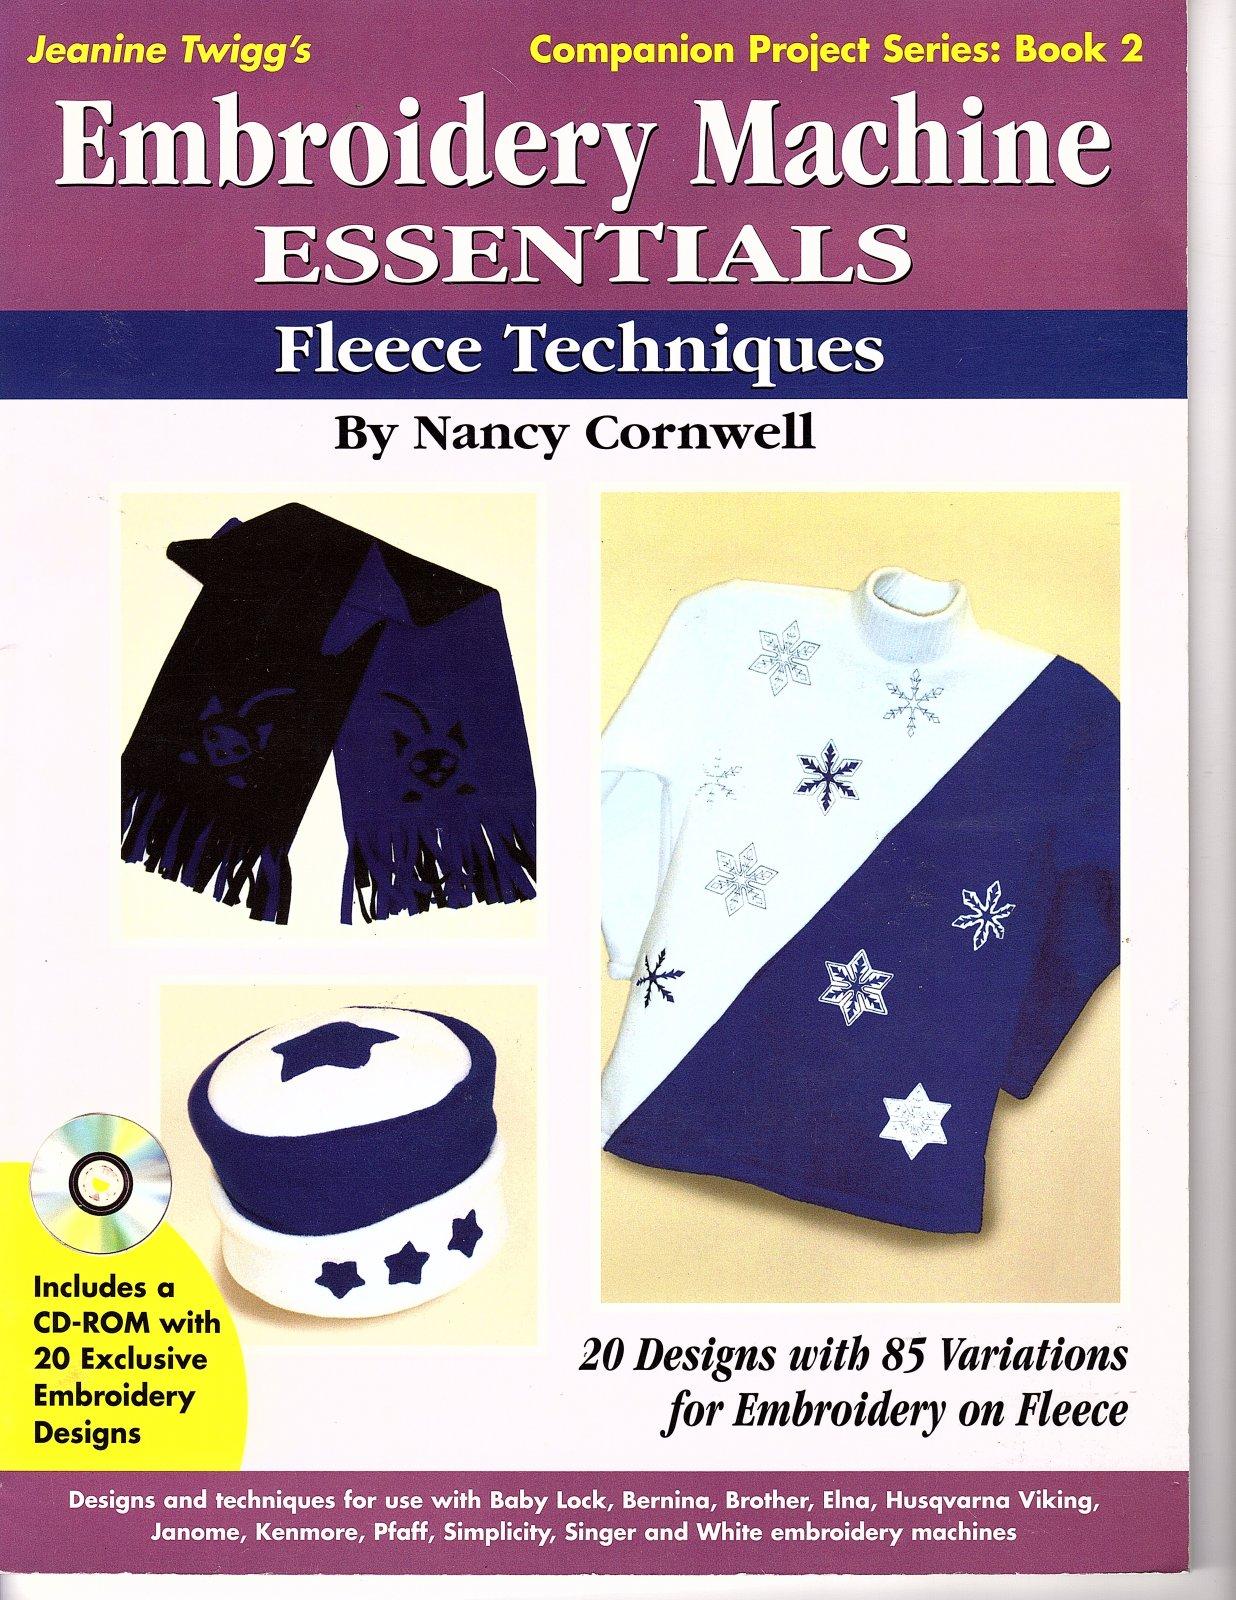 Embroidery Machine Essentials by Nancy Cornwell